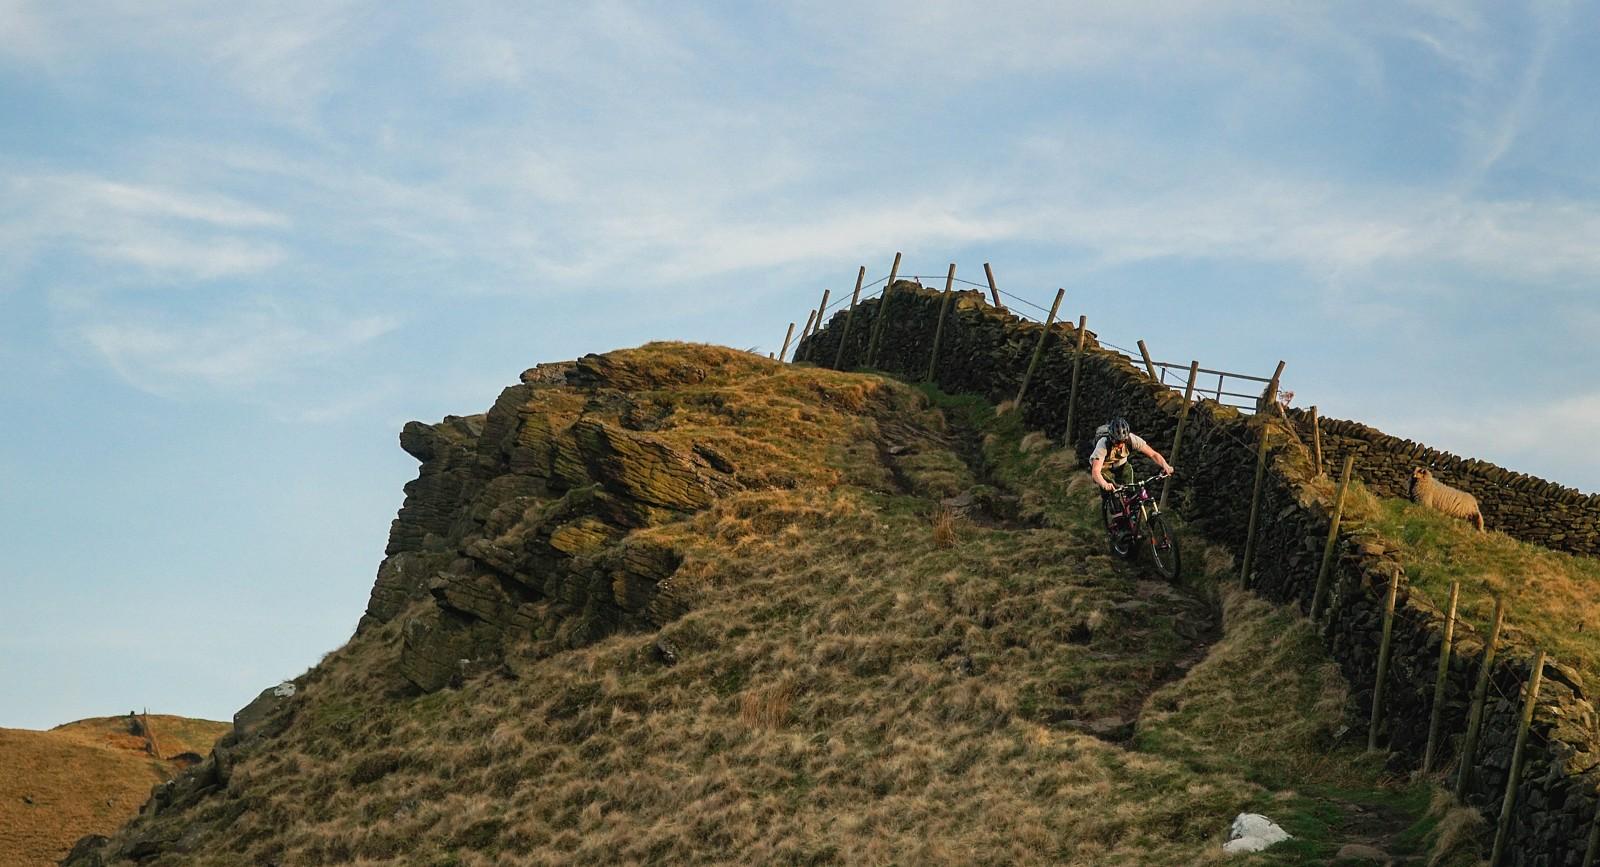 DSC09291 (2) - Mushrum - Mountain Biking Pictures - Vital MTB